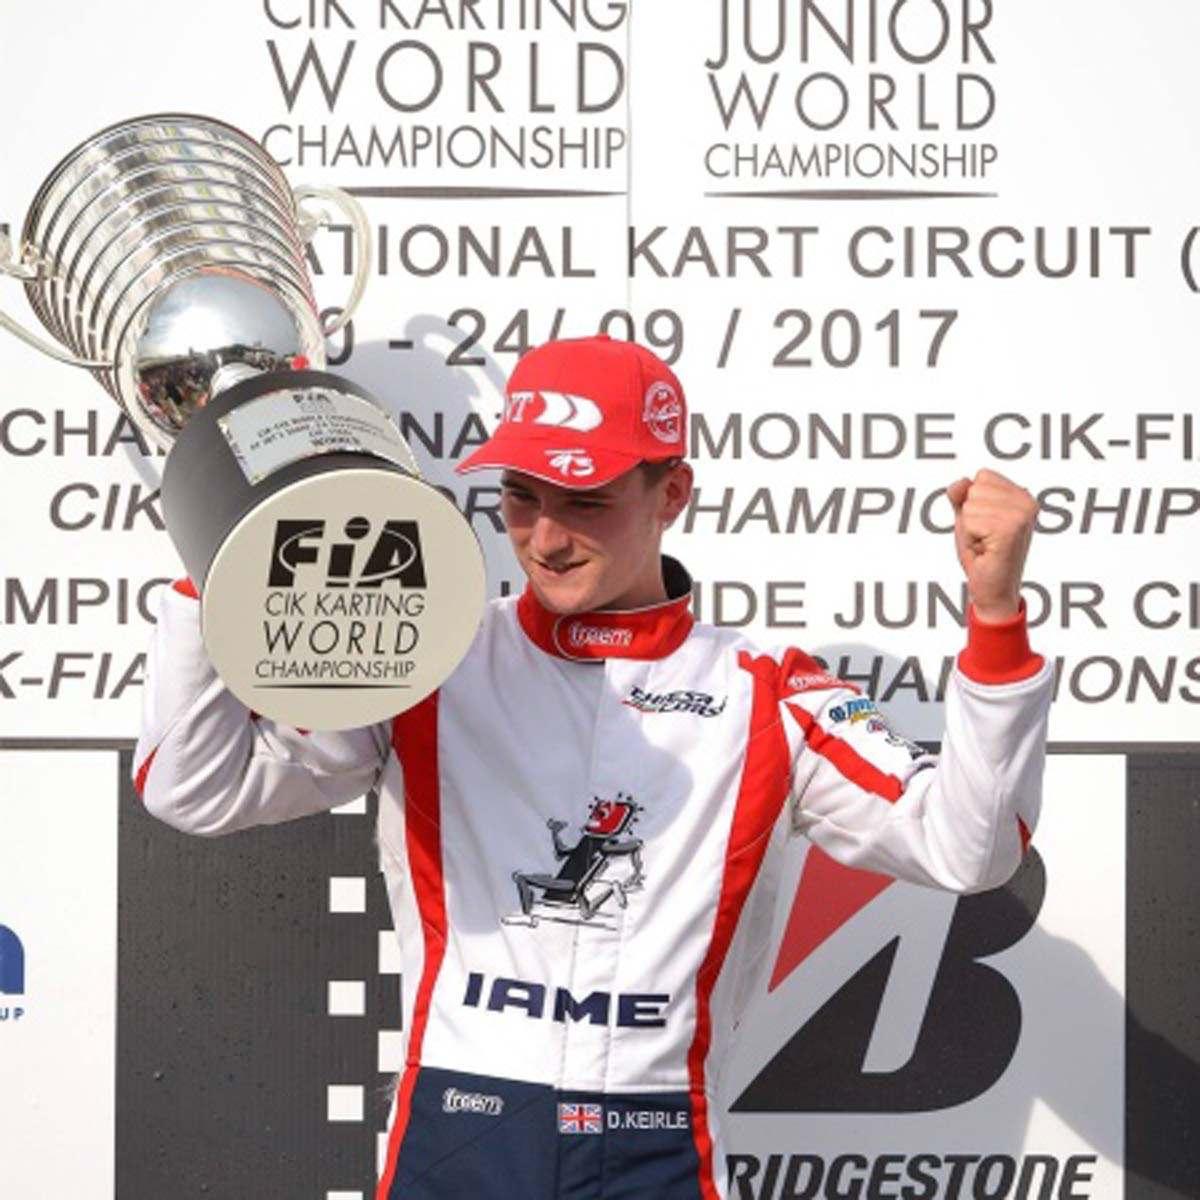 Danny Keirle - CIK-FIA Karting World Champion